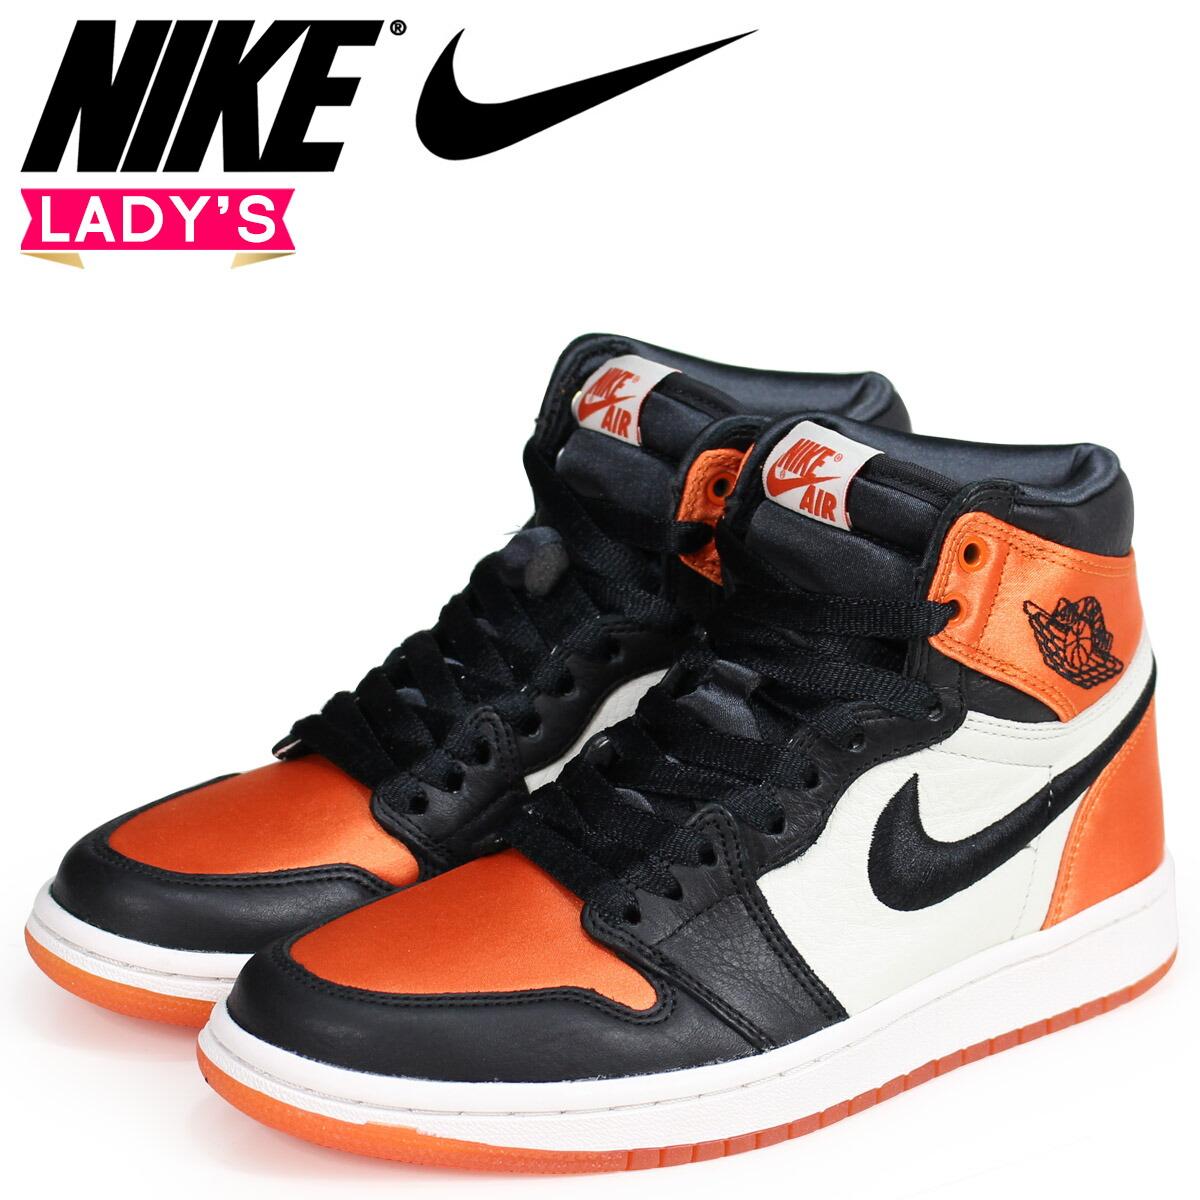 air jordan 1 high satin orange